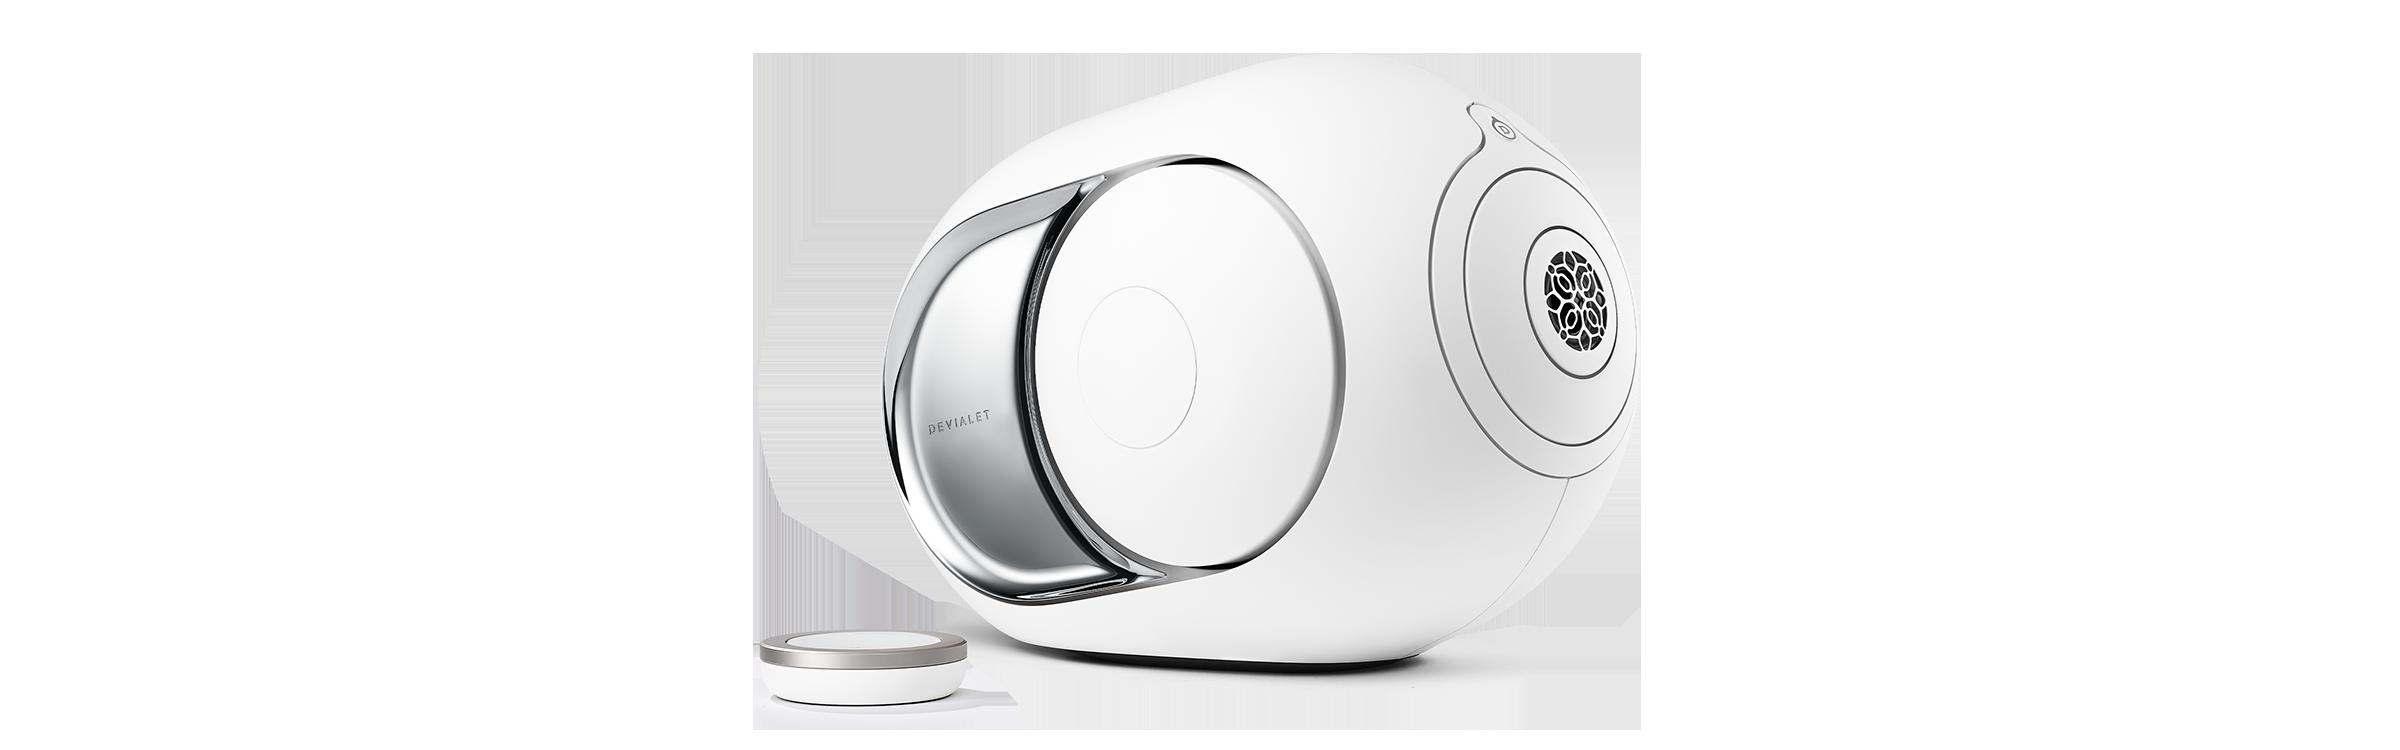 Phantom I 103 dB Iconic white